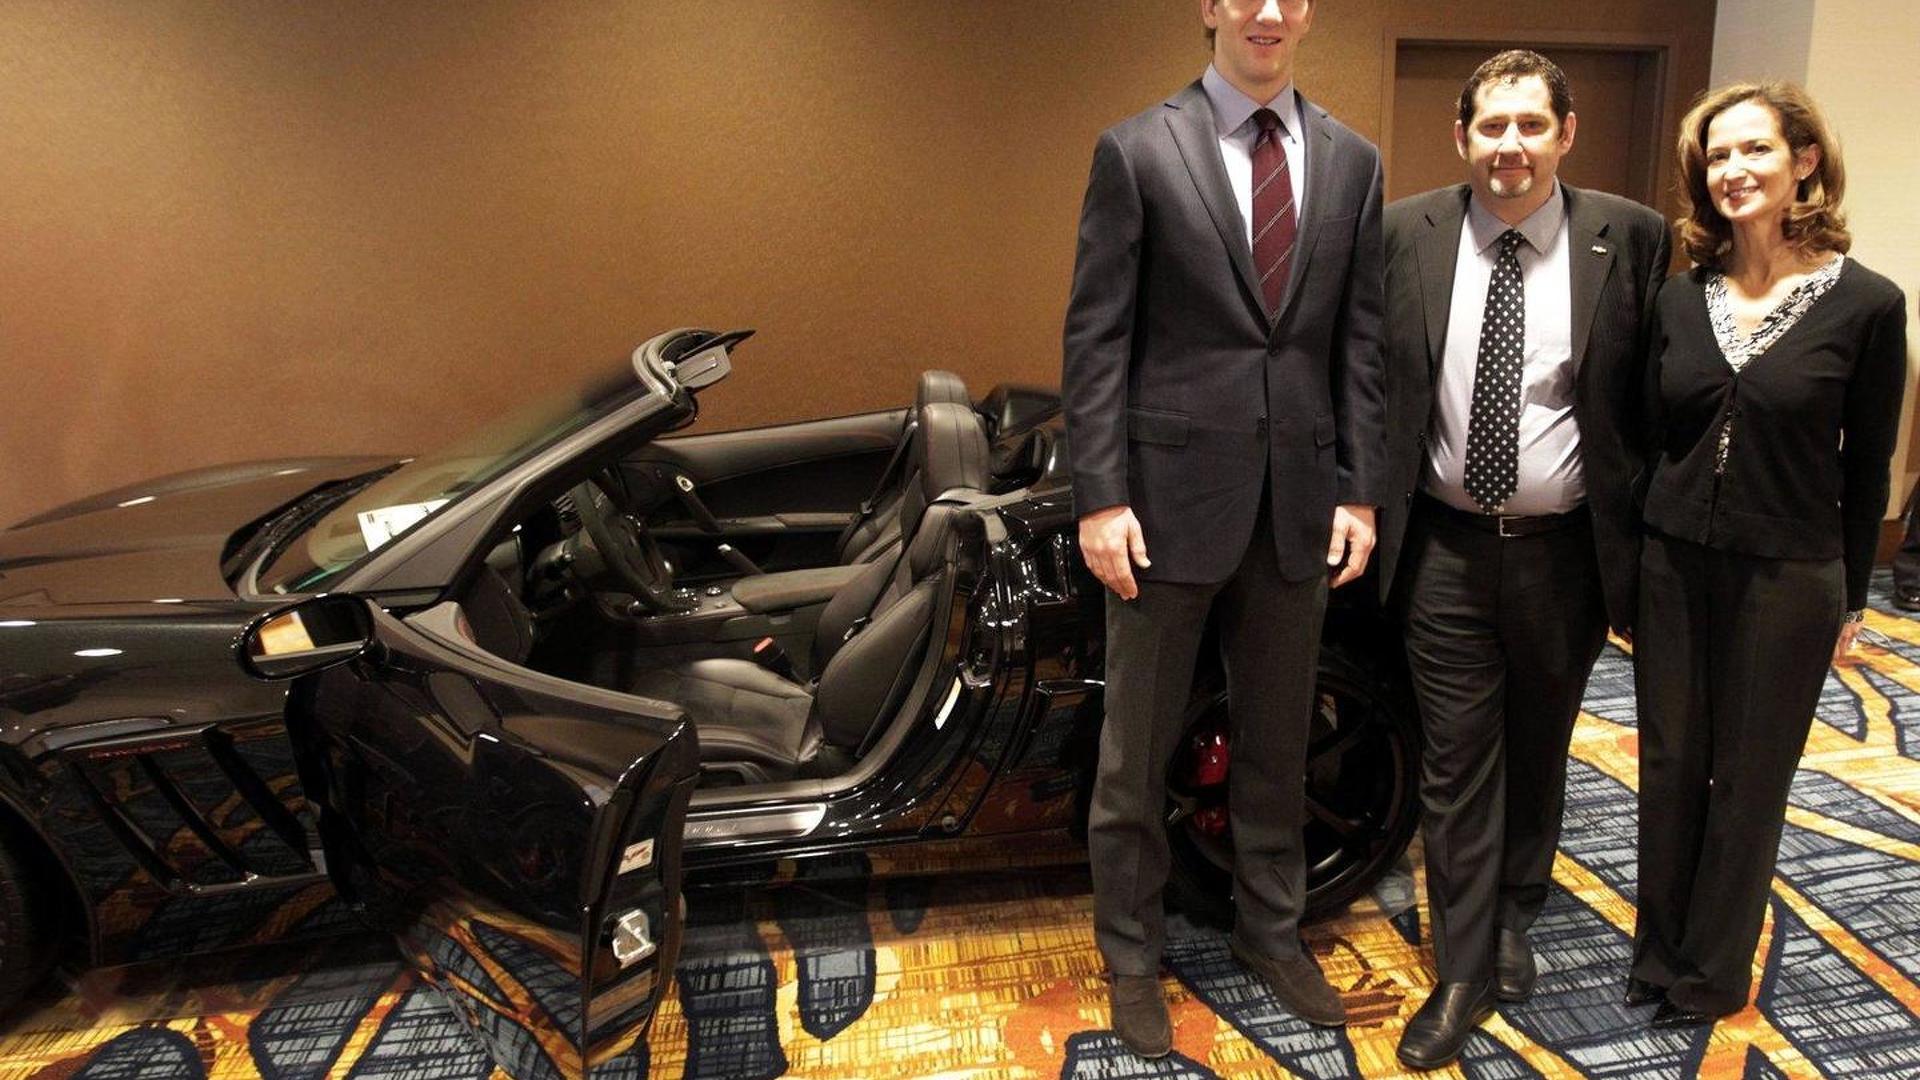 Super Bowl XLVI MVP presented with 2012 Corvette Grand Sport Convertible Centennial Edition